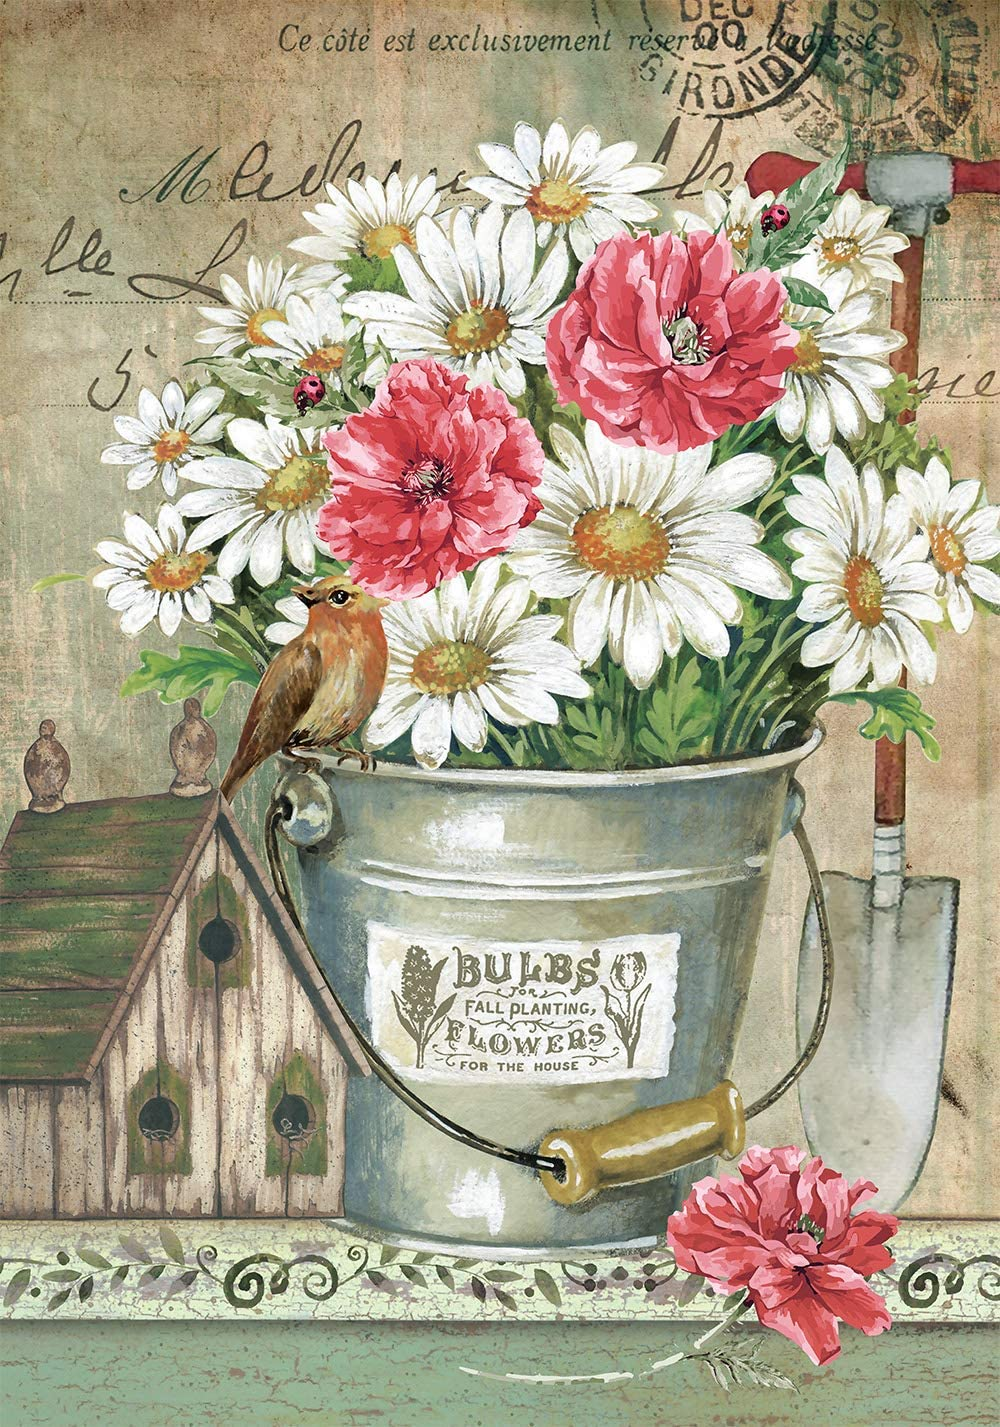 Texupday Daisies Floral Flowers in Bucket Decoration Spring Birdhouse Farmhouse Garden Flag Outdoor Yard Flag 12